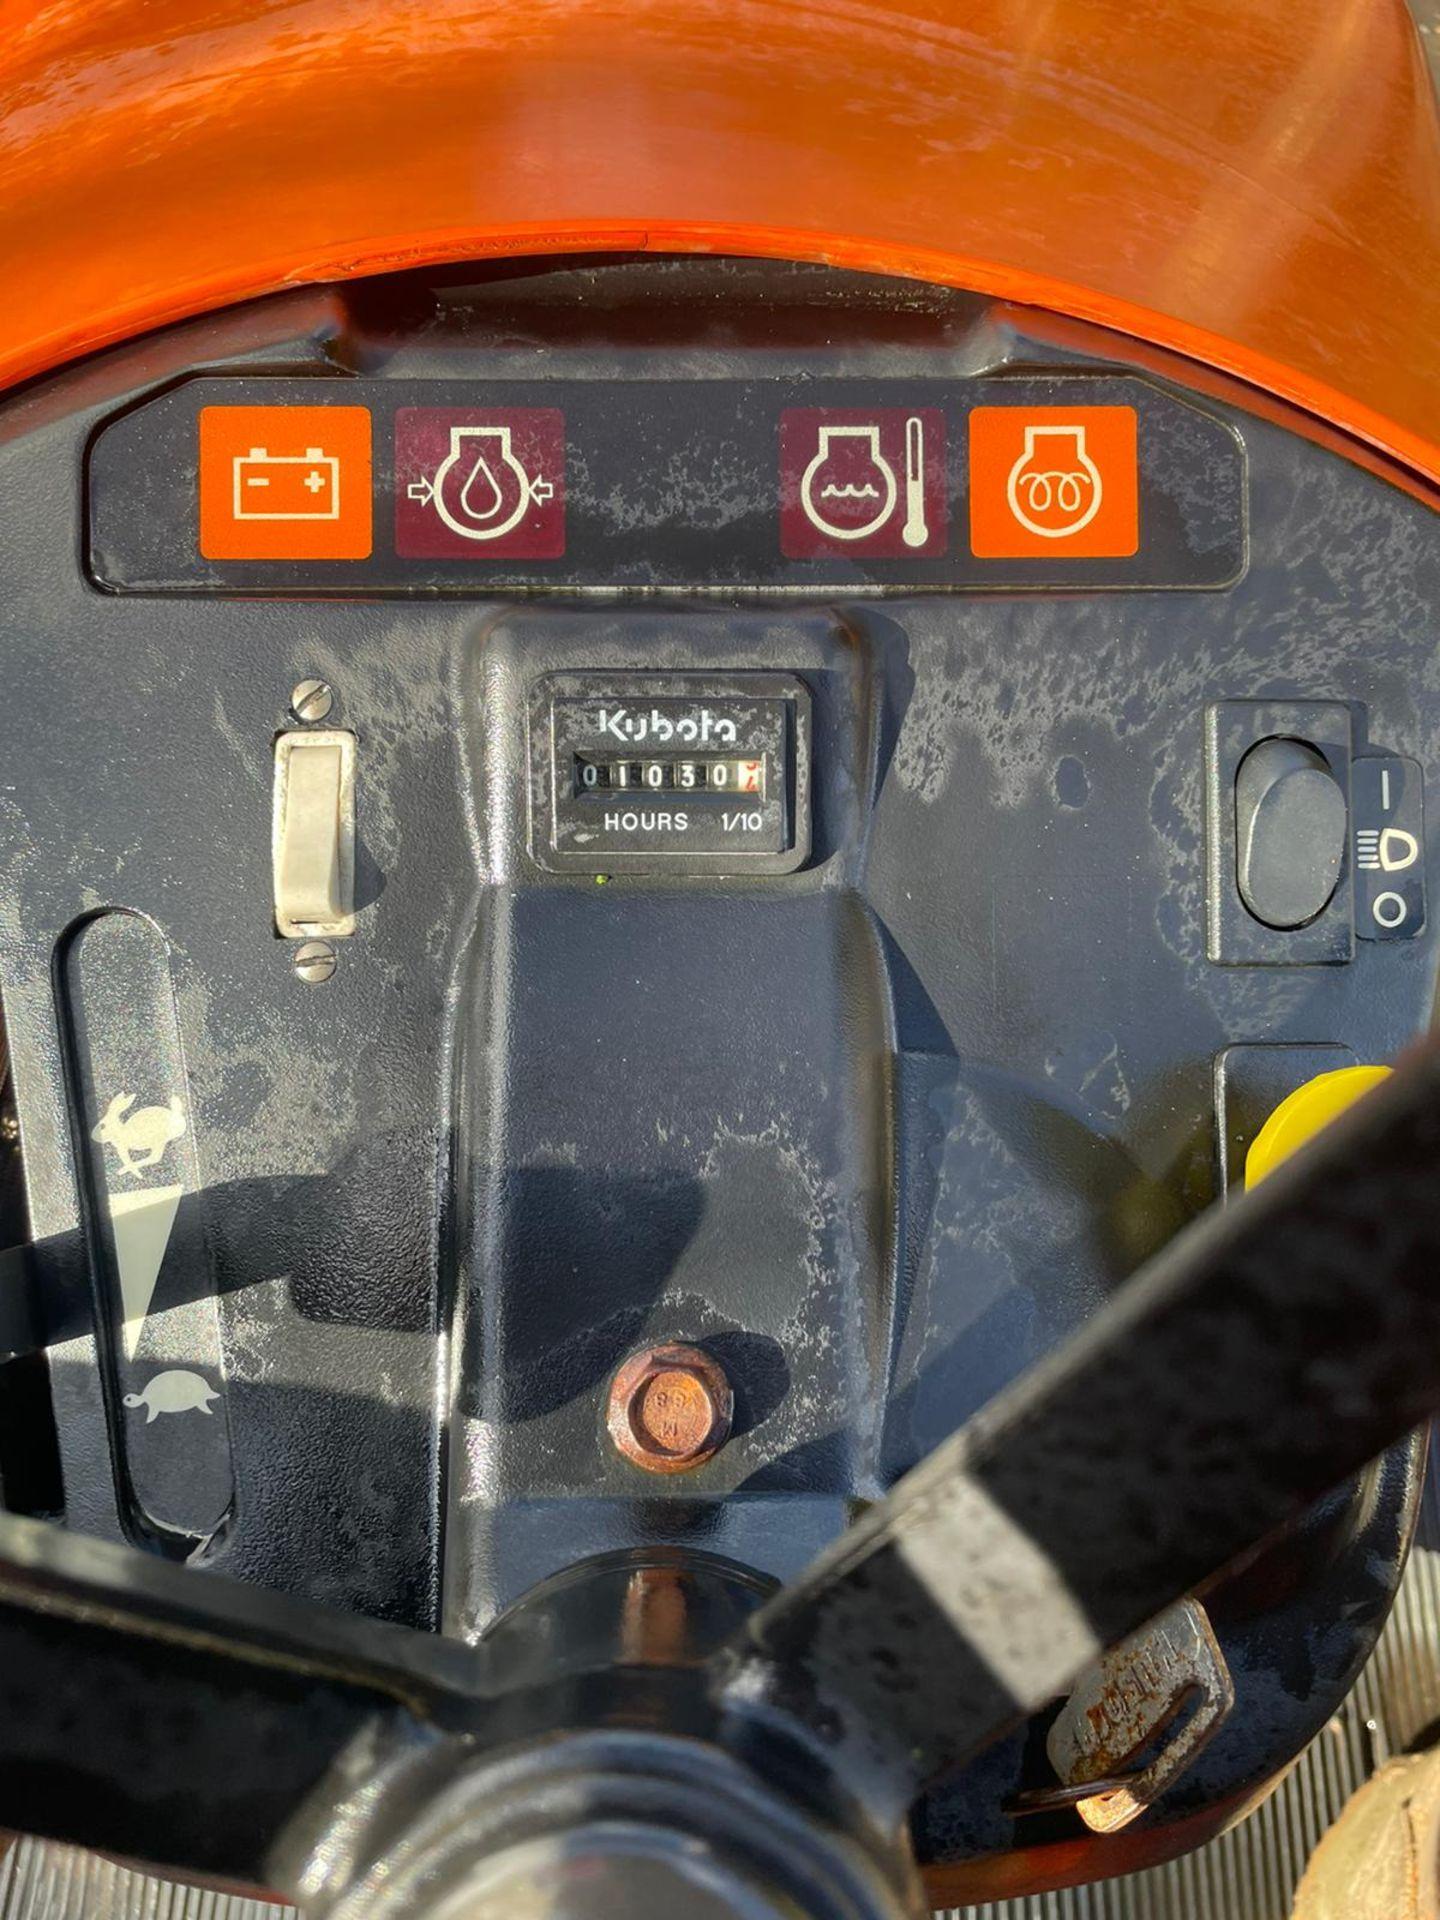 KUBOTA TG1860 RIDE ON LAWN MOWER, 3 CYLINDER KUBOTA DIESEL ENGINE, VERY LOW HOURS 1030 *NO VAT* - Image 5 of 7